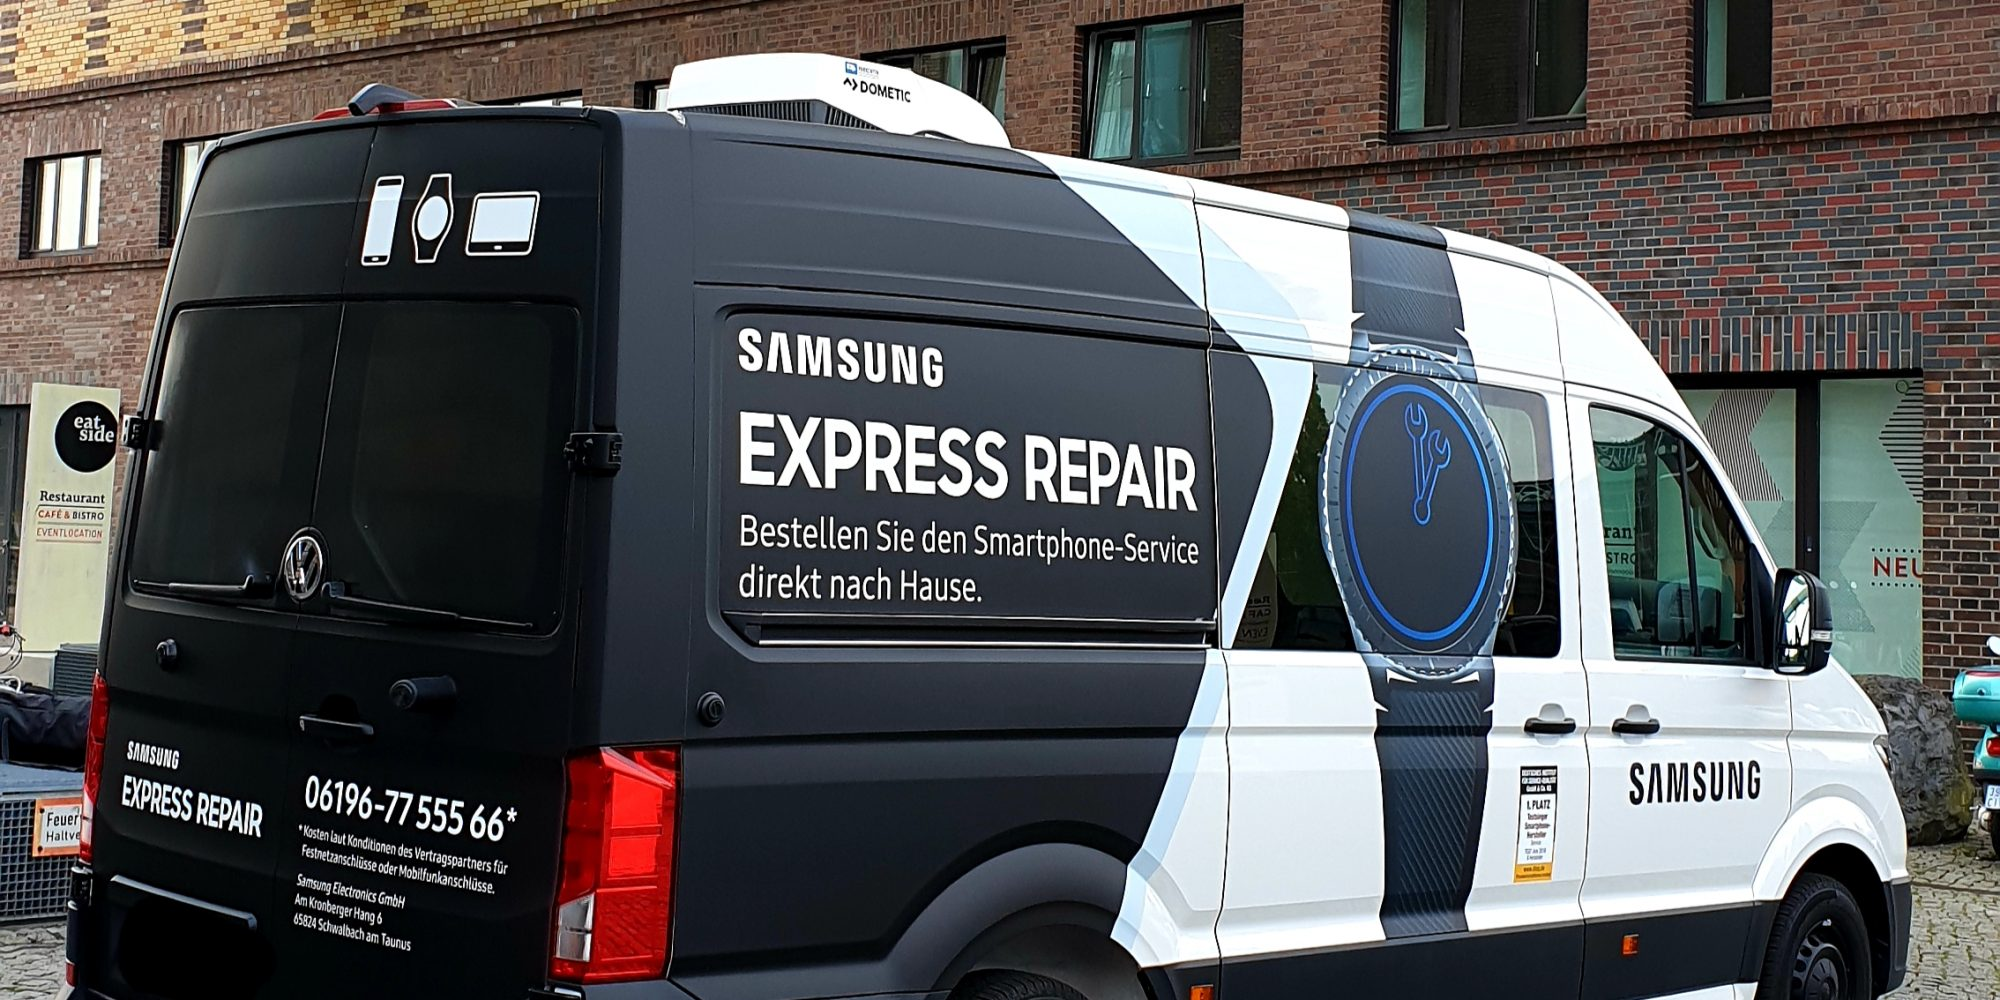 Samsung Express Repair